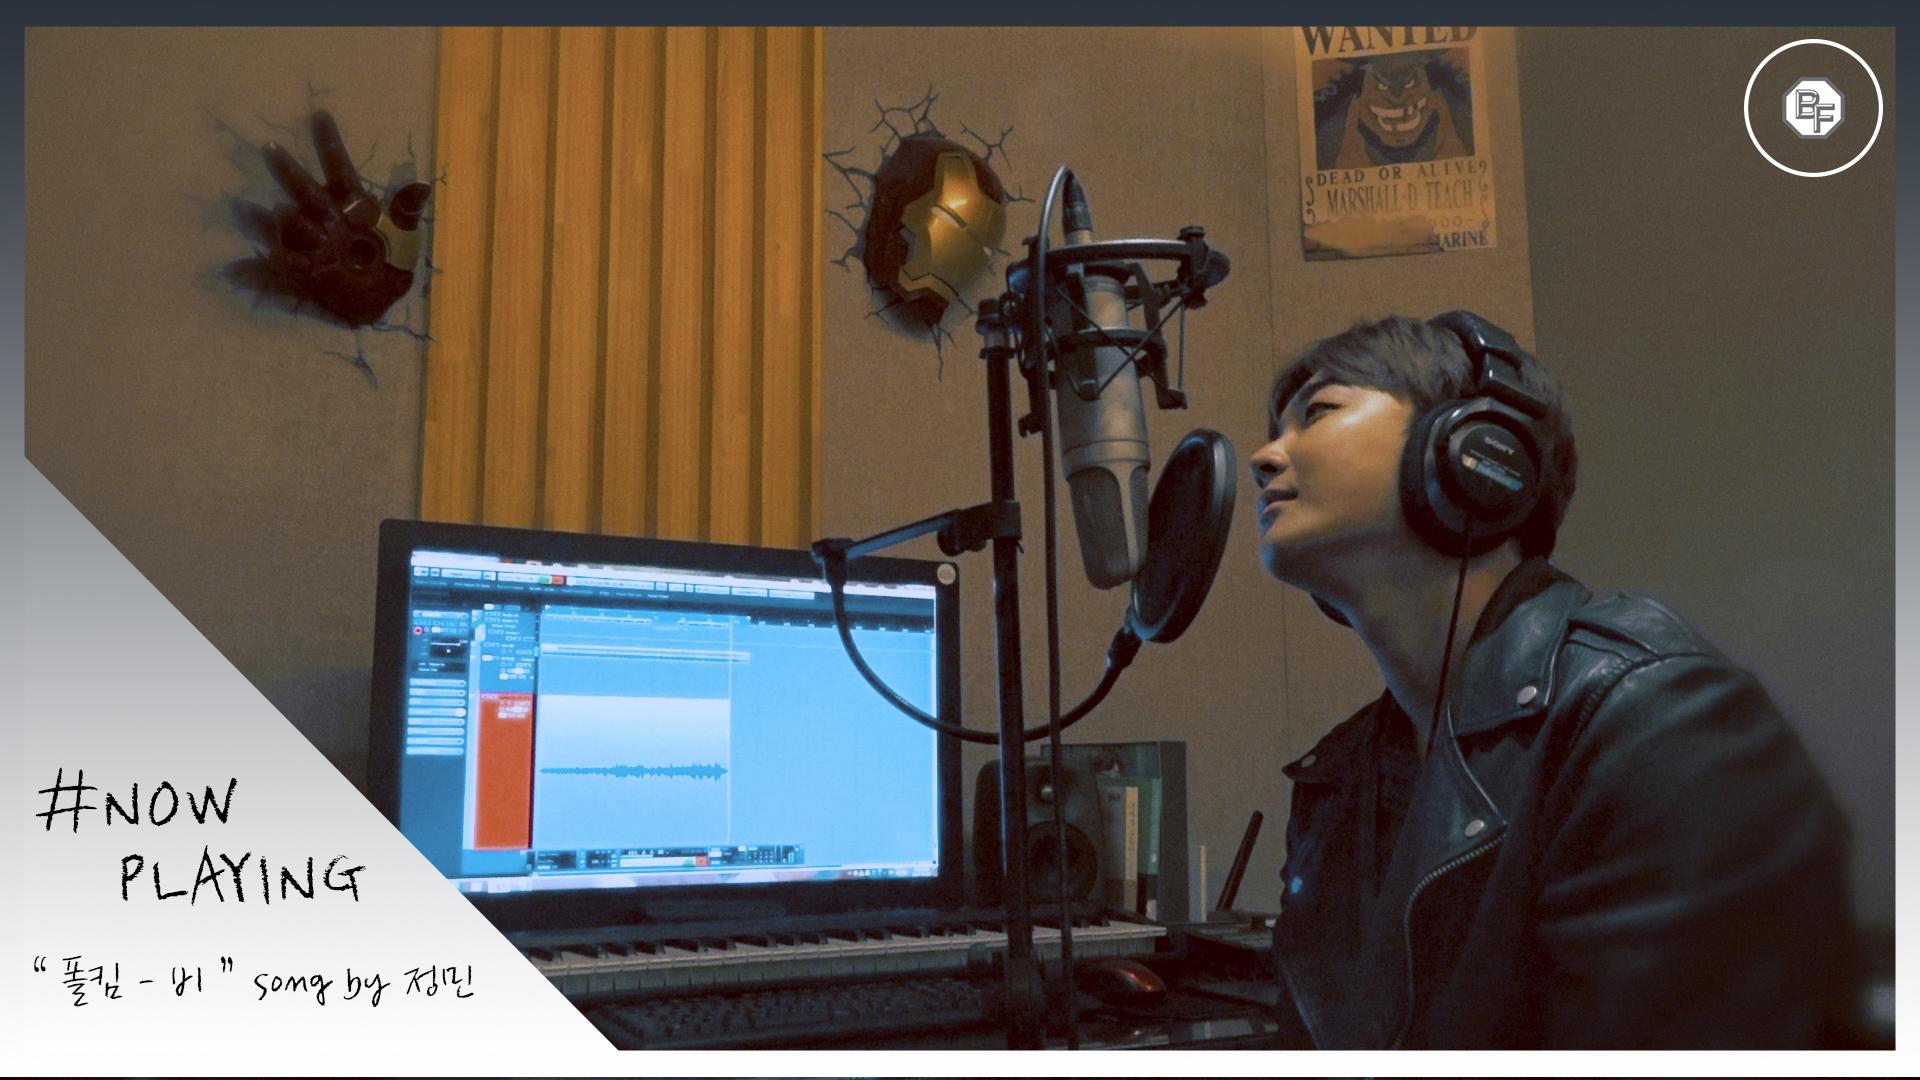 [#NOWPLAYING] 보이프렌드(BOYFRIEND) 정민 '폴킴 - 비' Cover